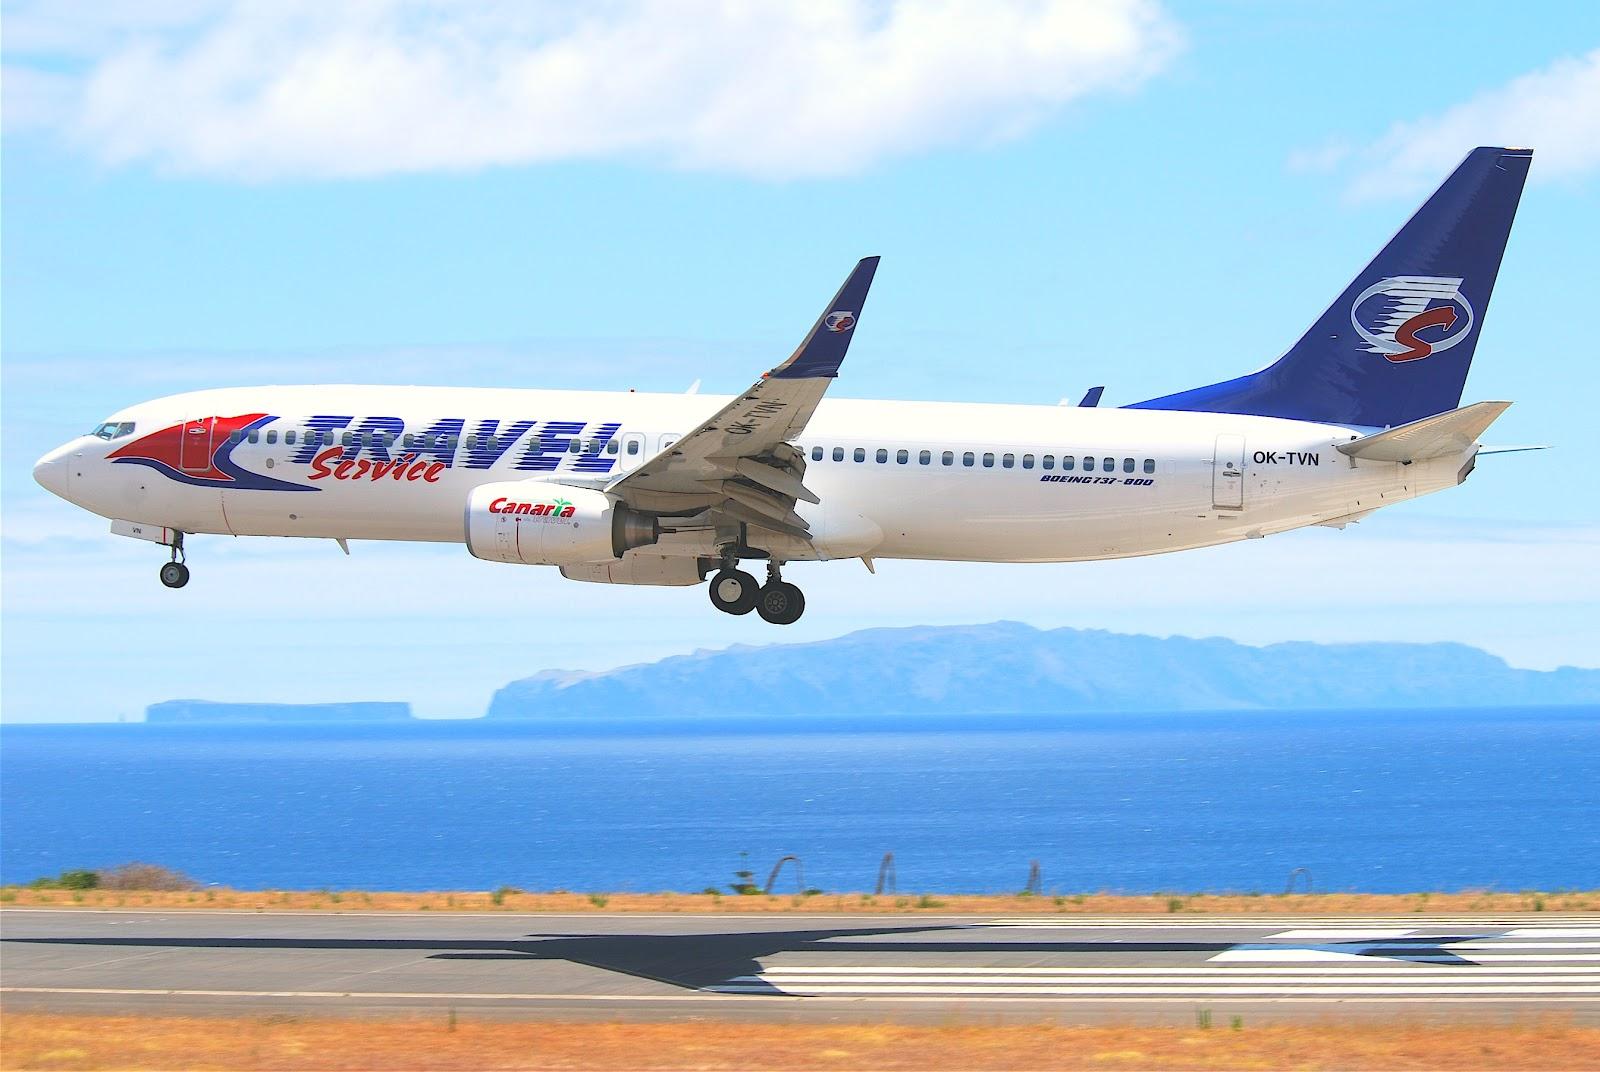 Travel_Service_Boeing_737-8BK%3B_OK-TVN@FNC%3B12.07.2011_607an_(5940100846).jpg